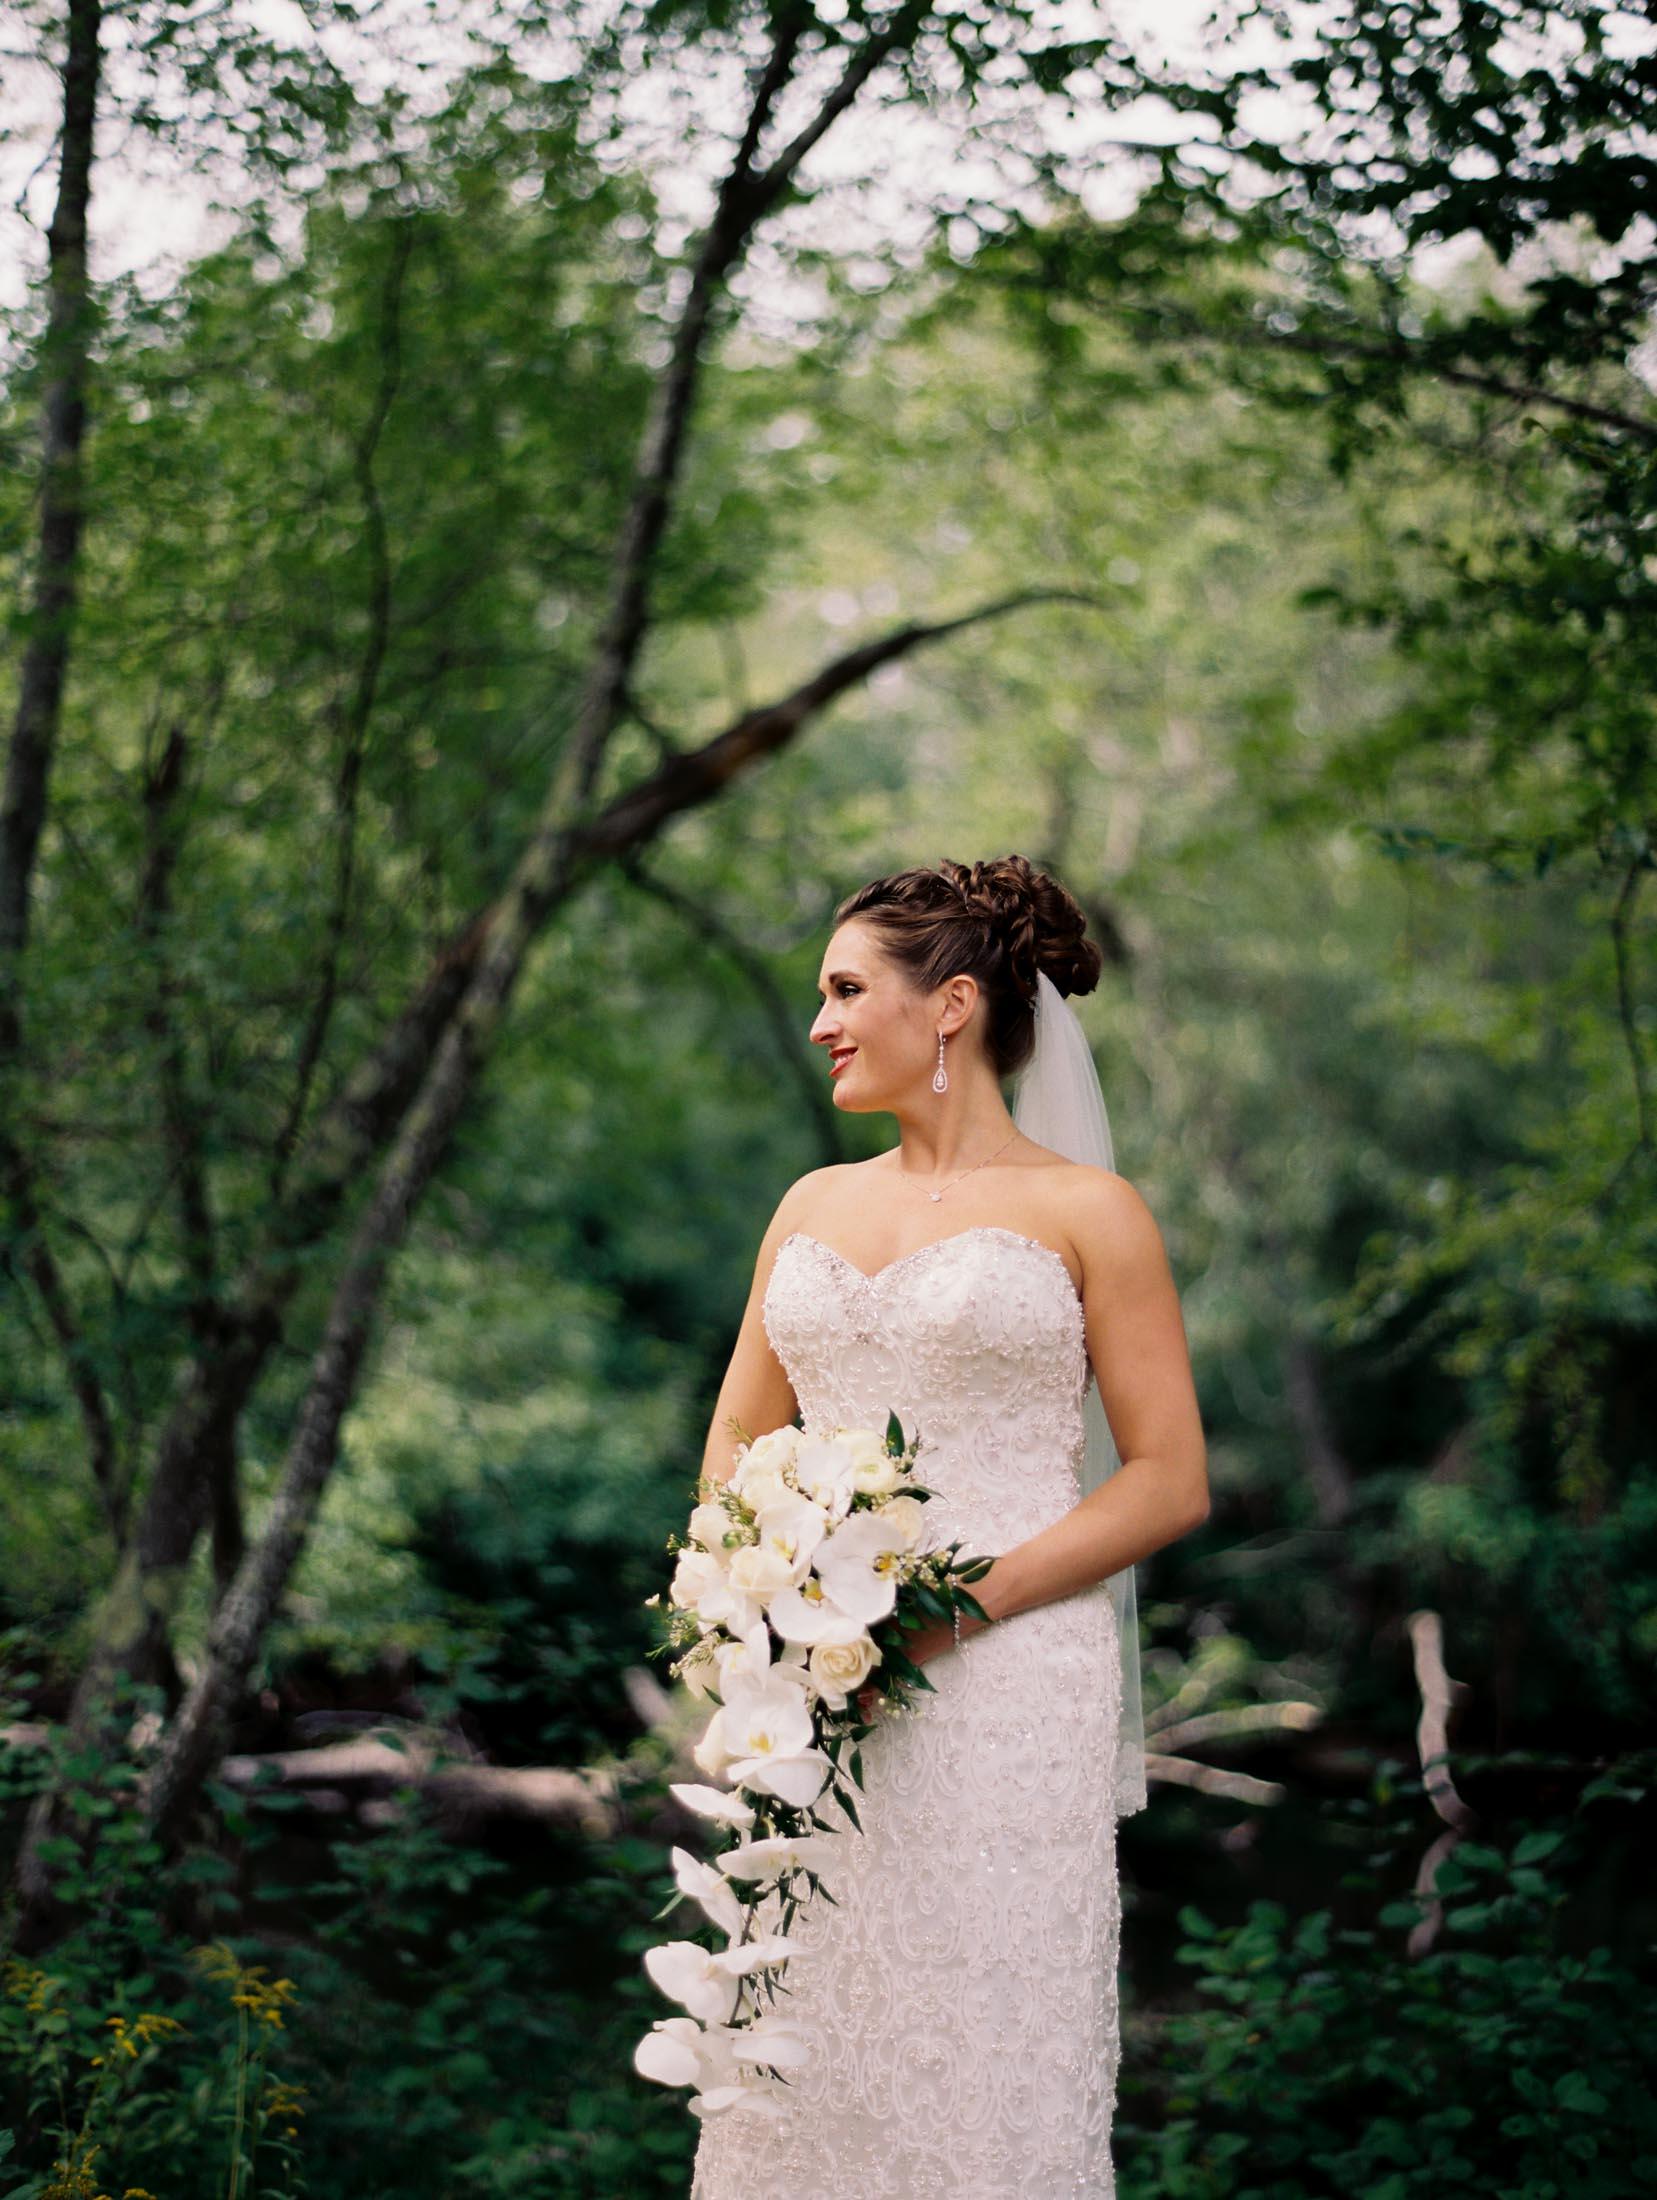 Willowdale-wedding-photography-8.jpg